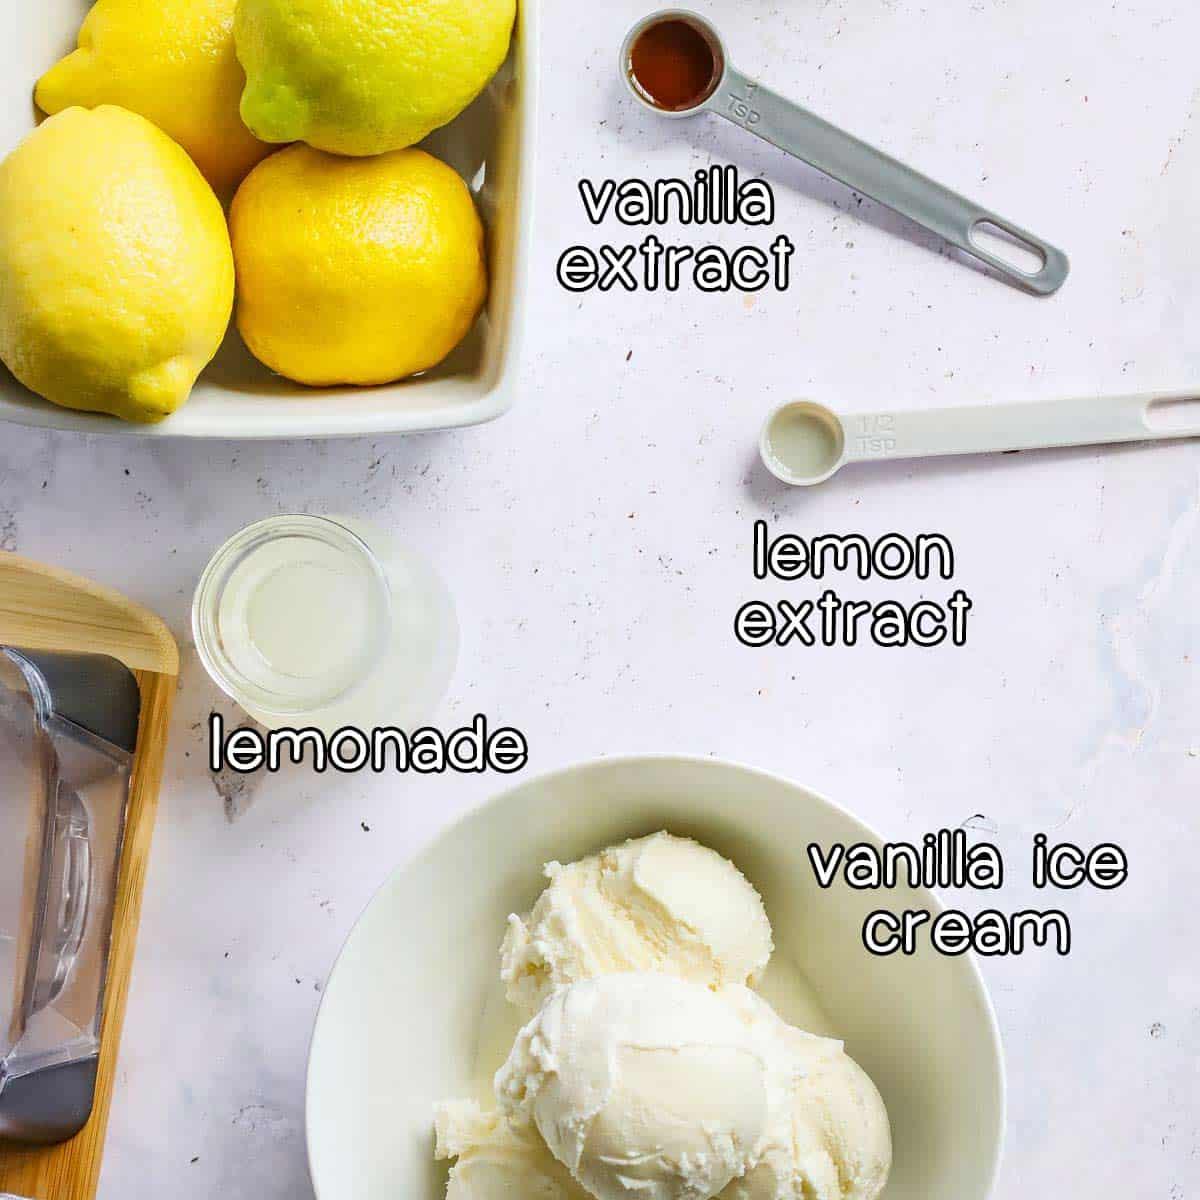 Overhead shot of frosted lemonade ingredients- vanilla extract, lemon extract, lemonade, and vanilla ice cream.